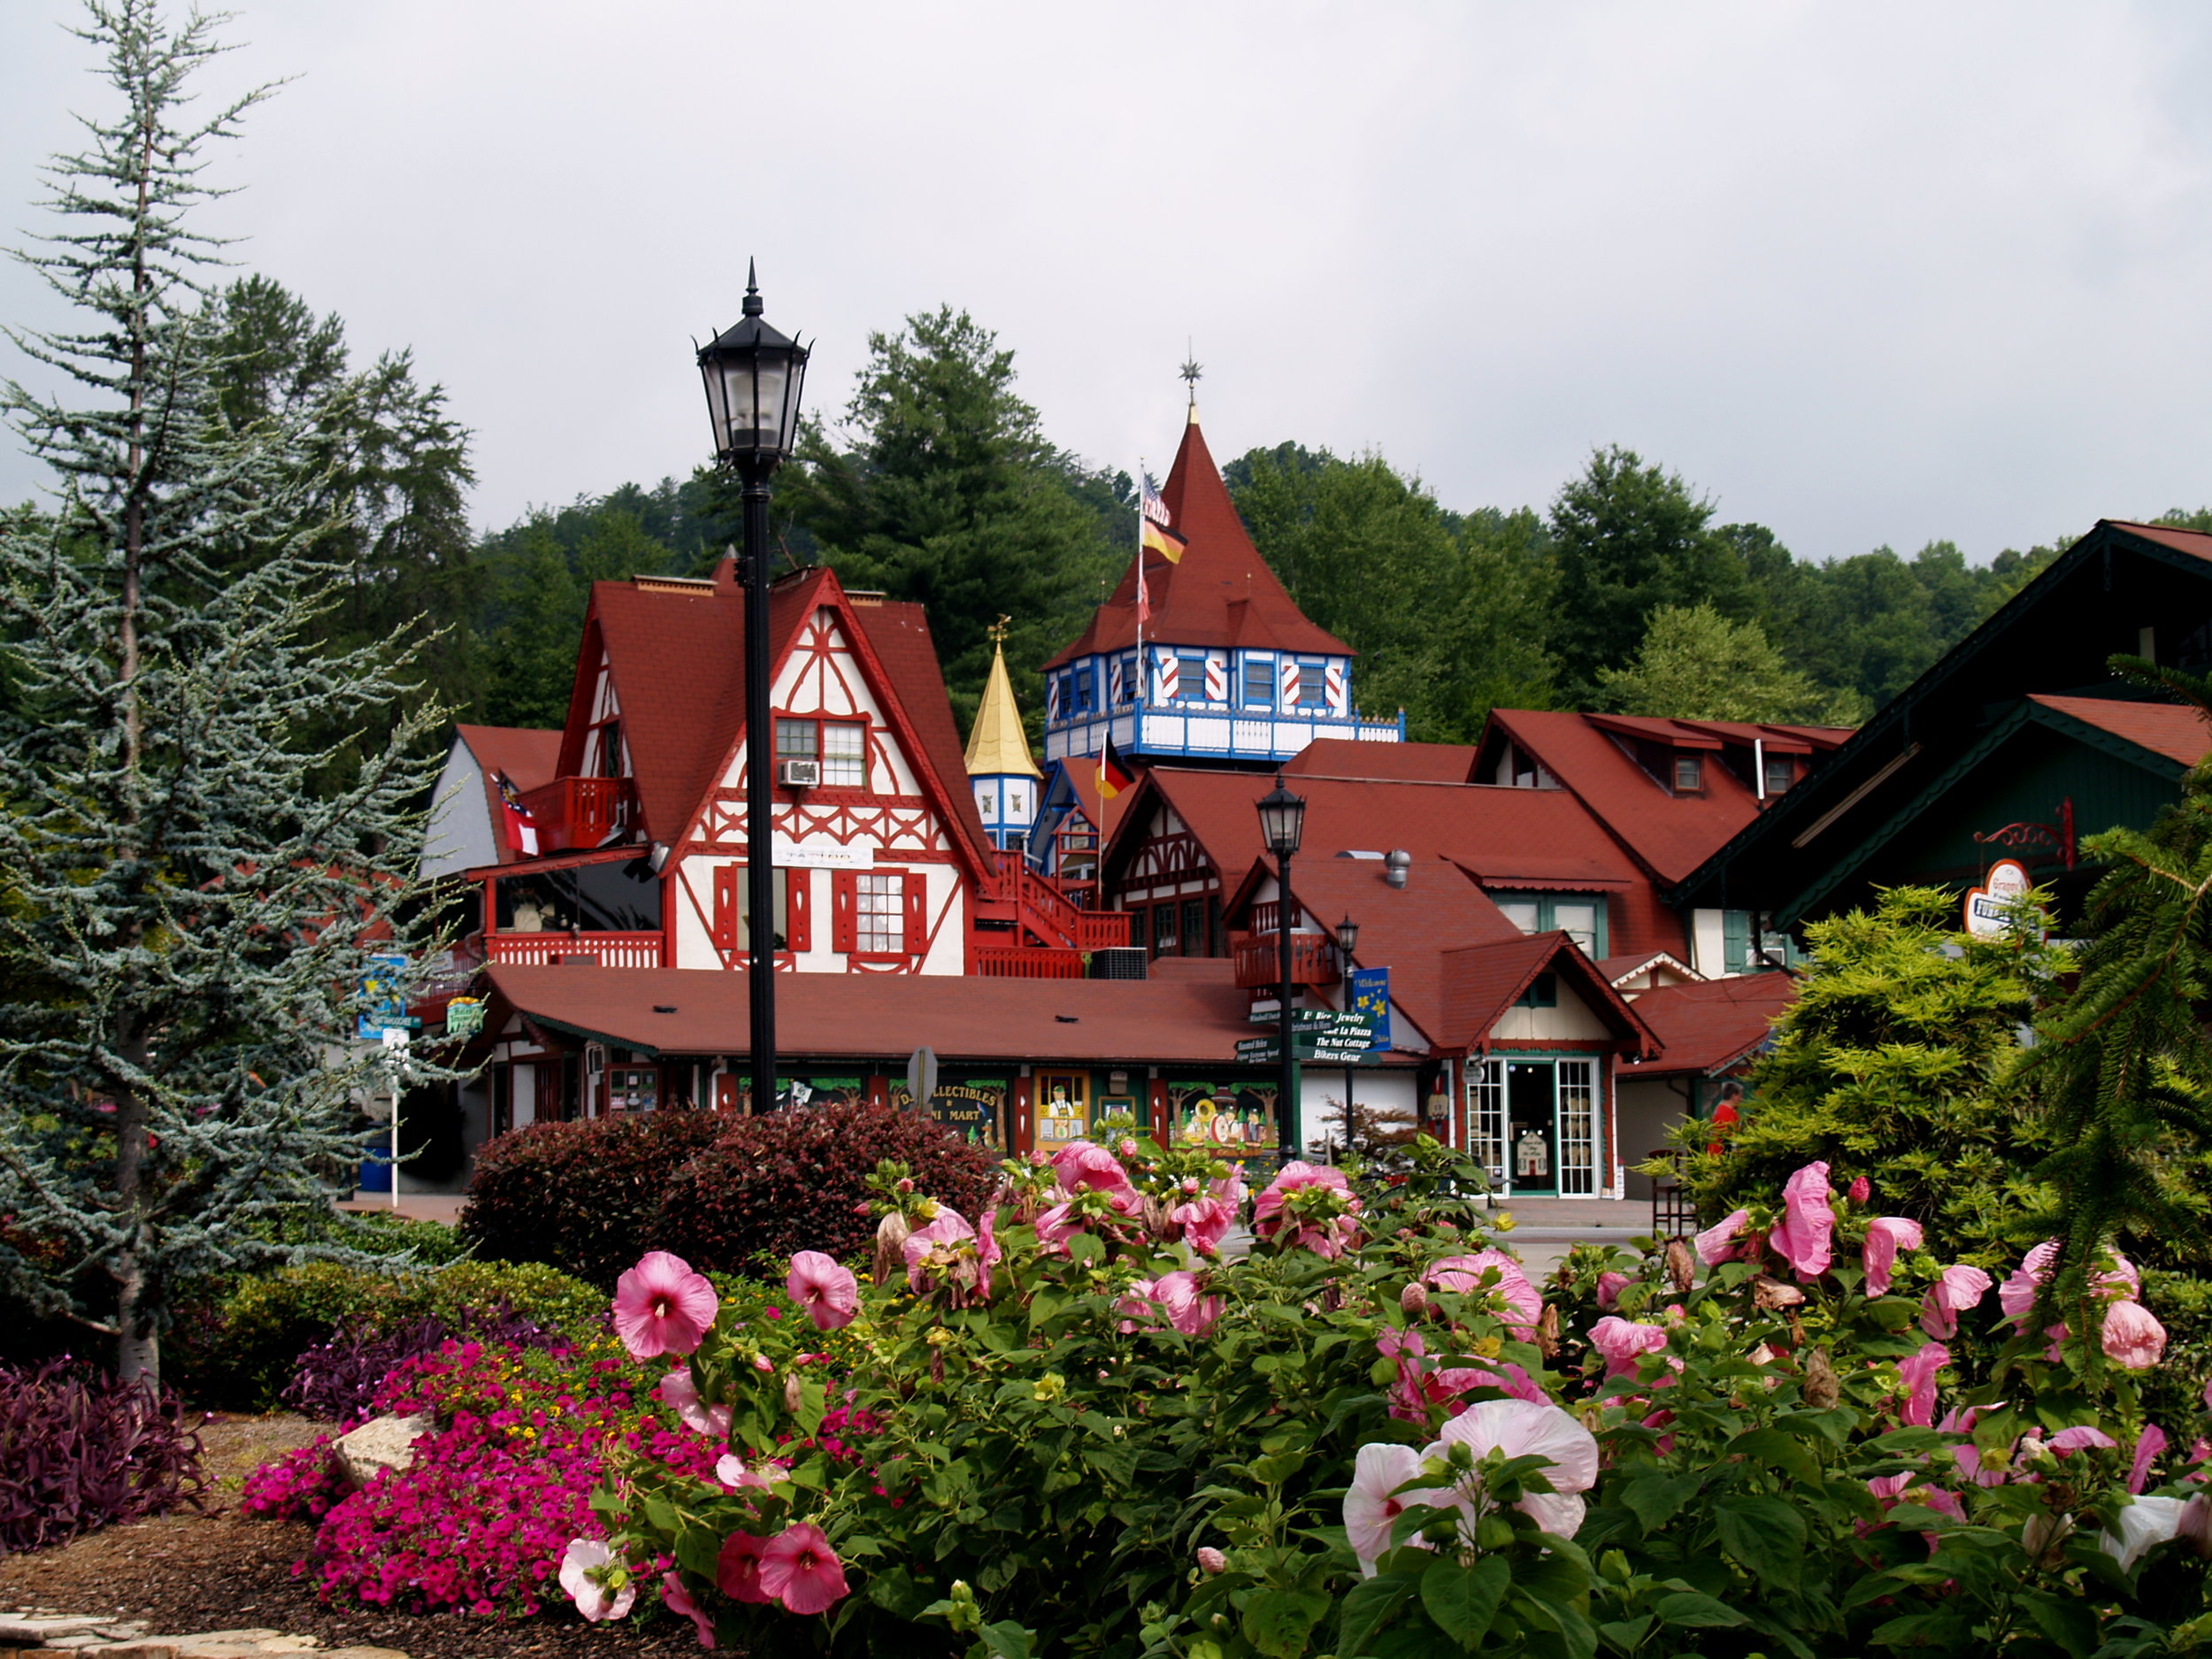 helen-springfest-1427482403.jpg